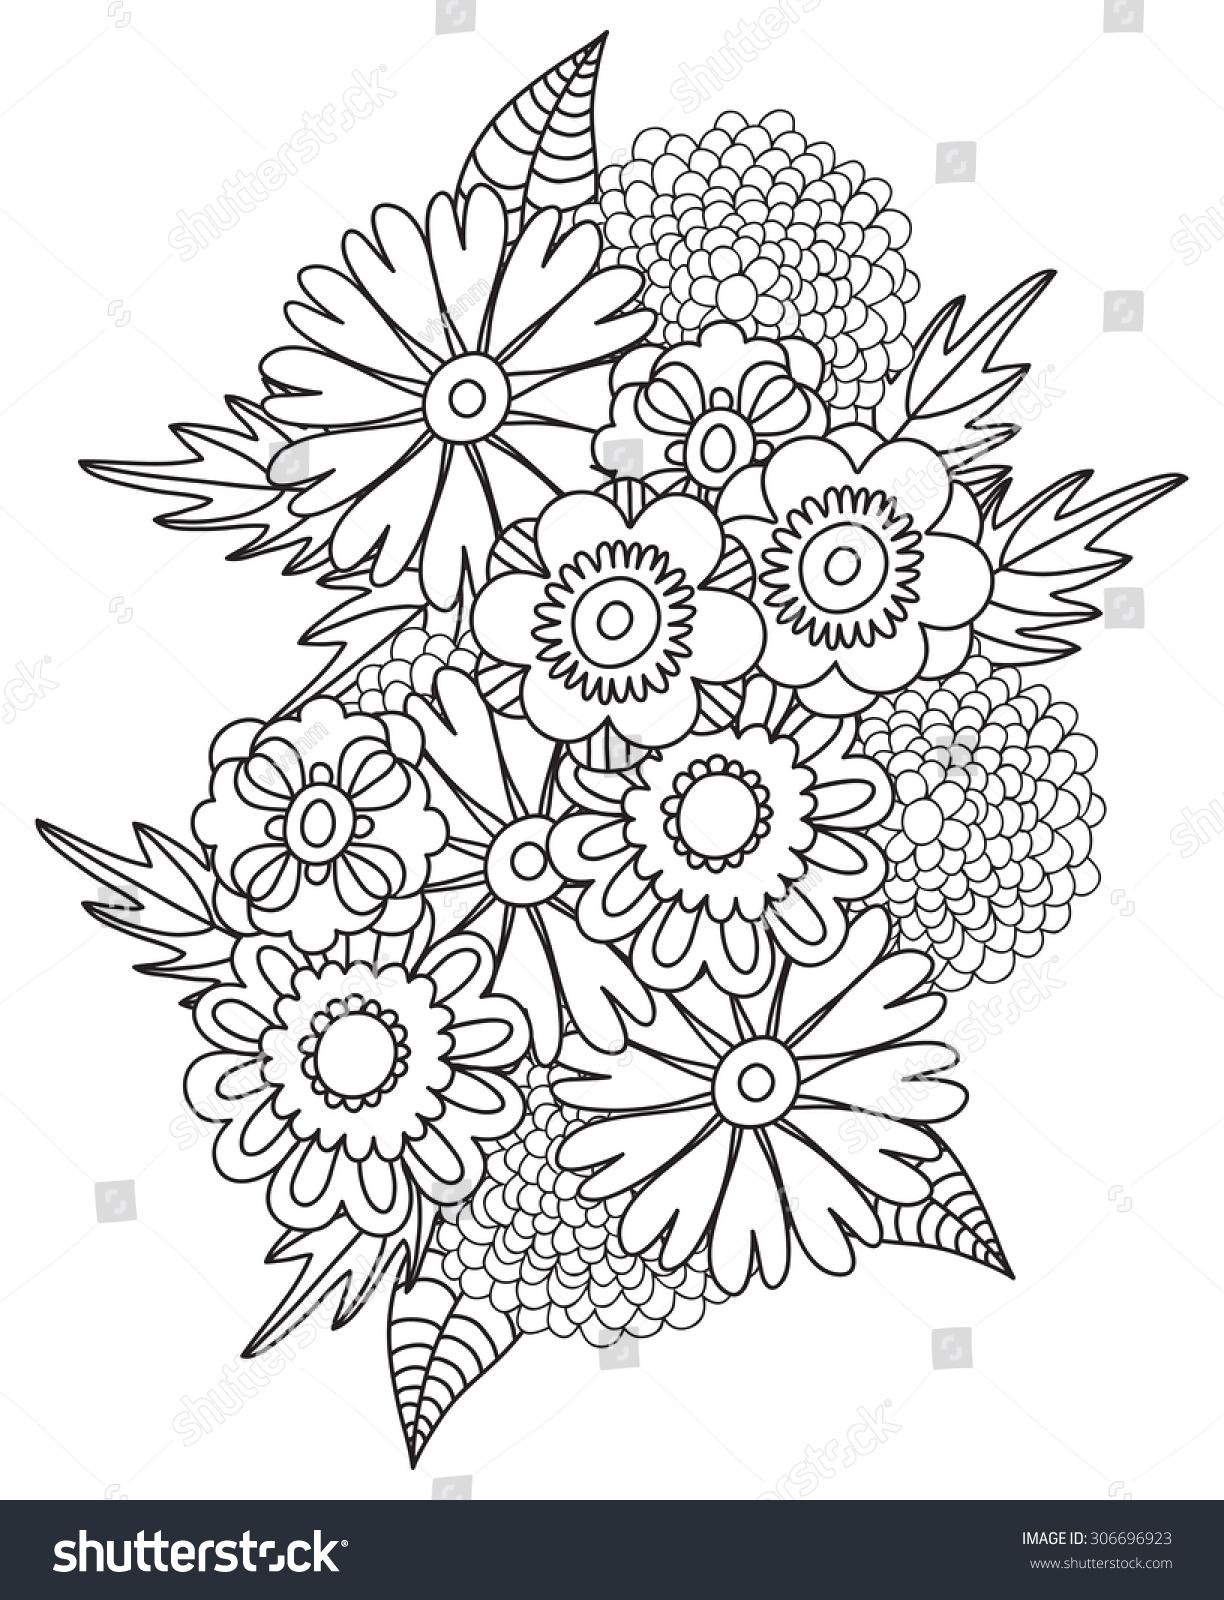 Beautiful Doodle Art Flowers Zentangle Floral Stock Vector Royalty